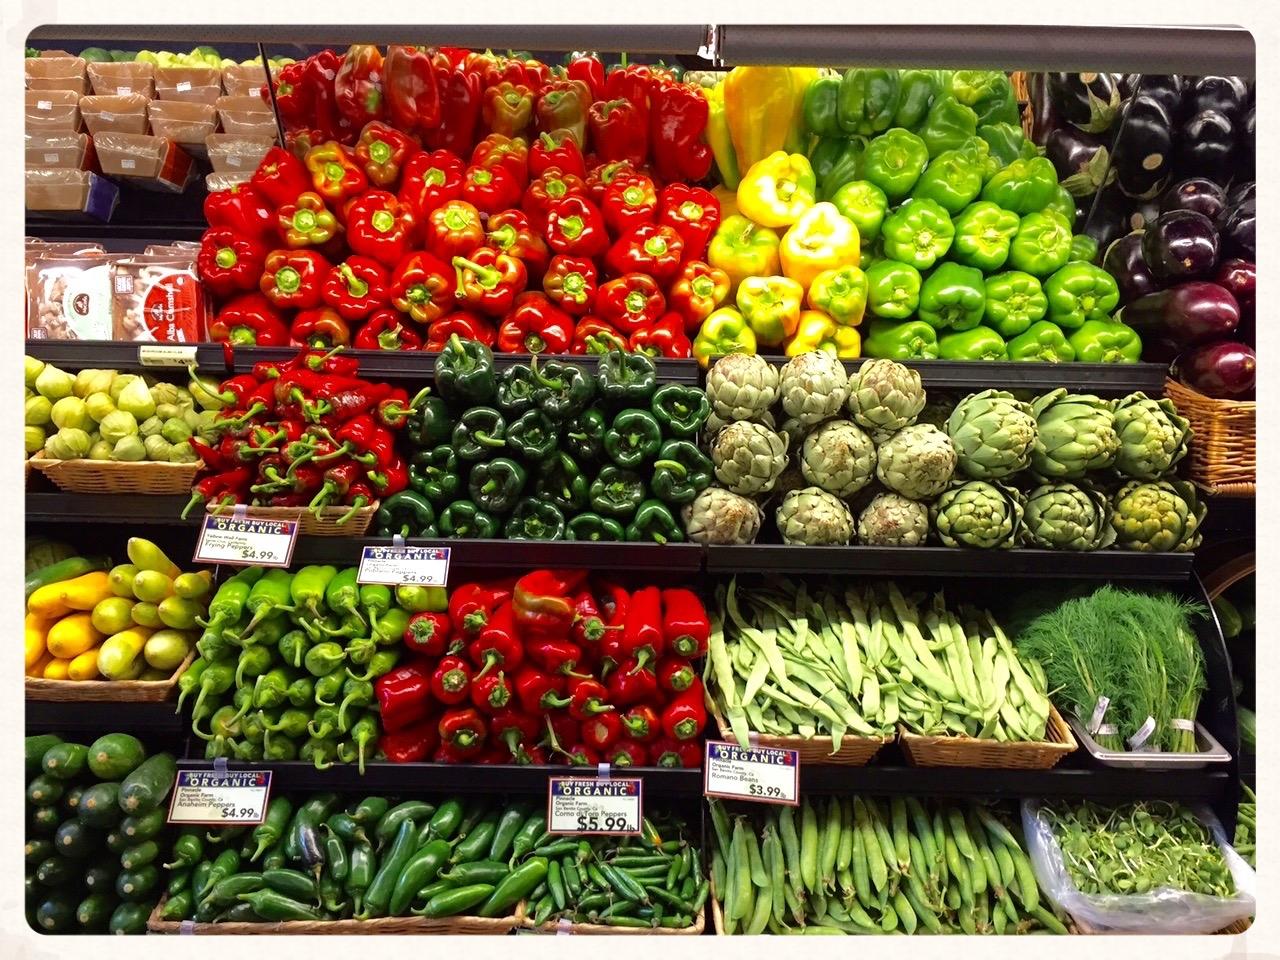 My boyfriends beautiful produce display. Food is precious.